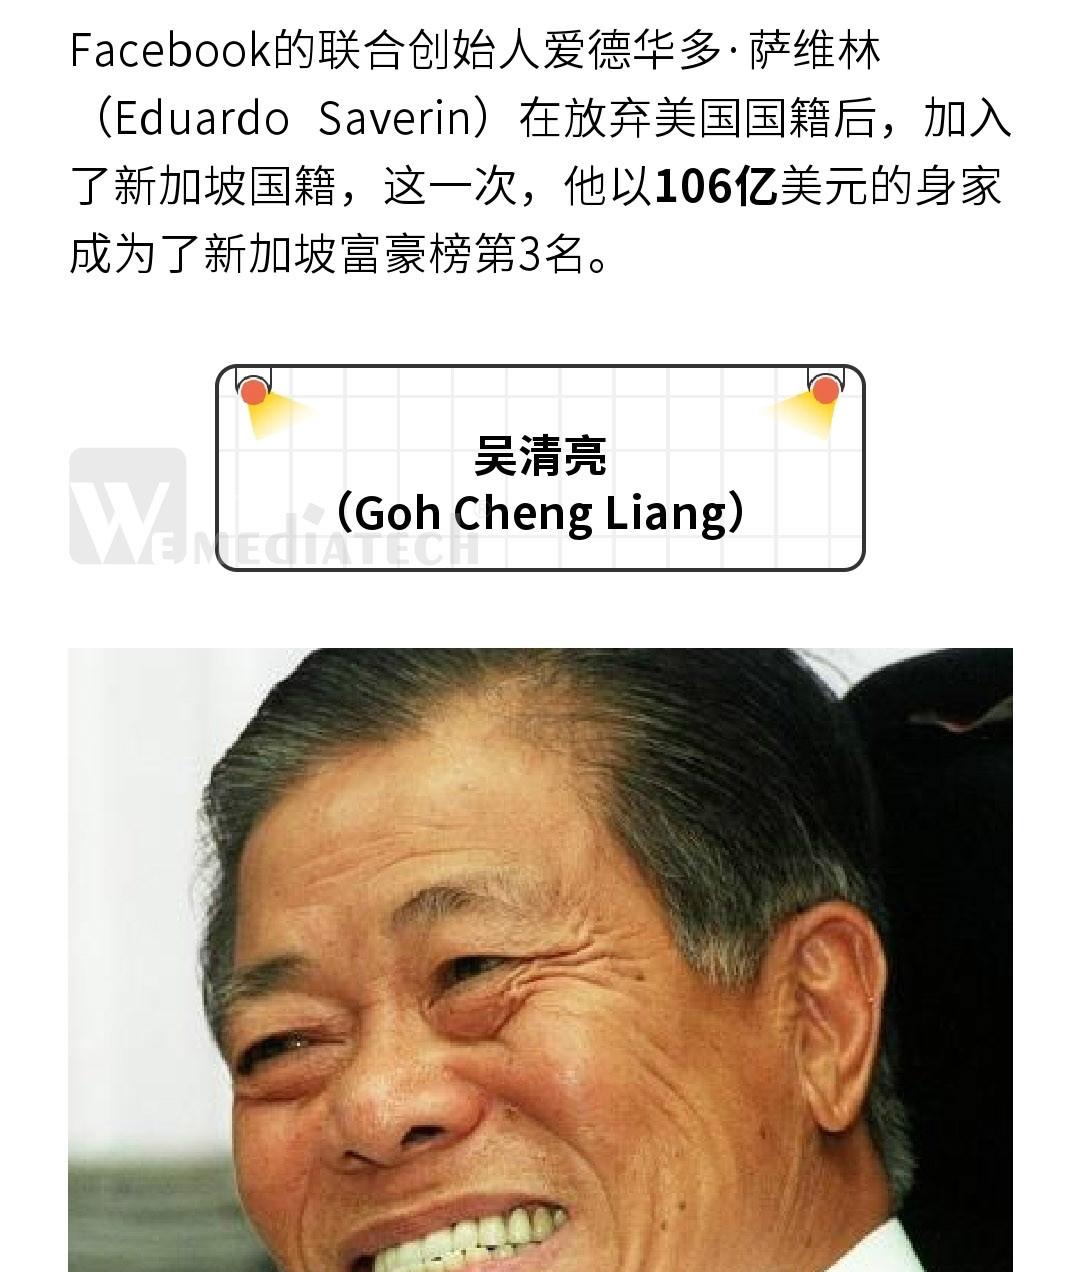 fuhao-2_qietu_1.jpg